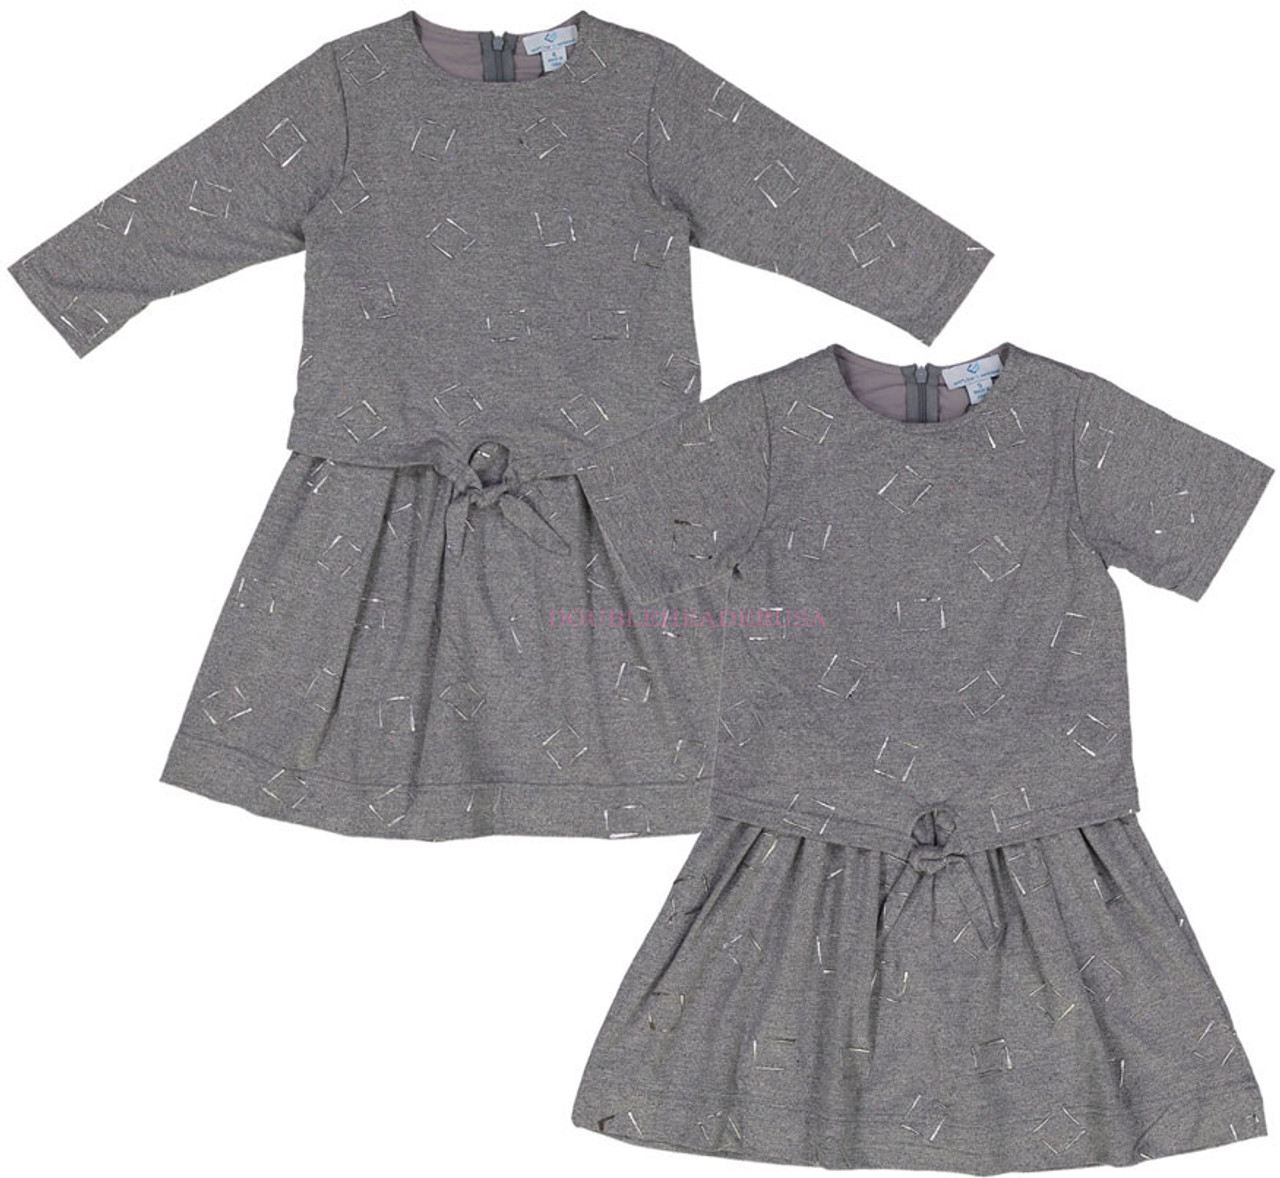 WHITLOW & HAWKINS GIRLS DRESS - 1172